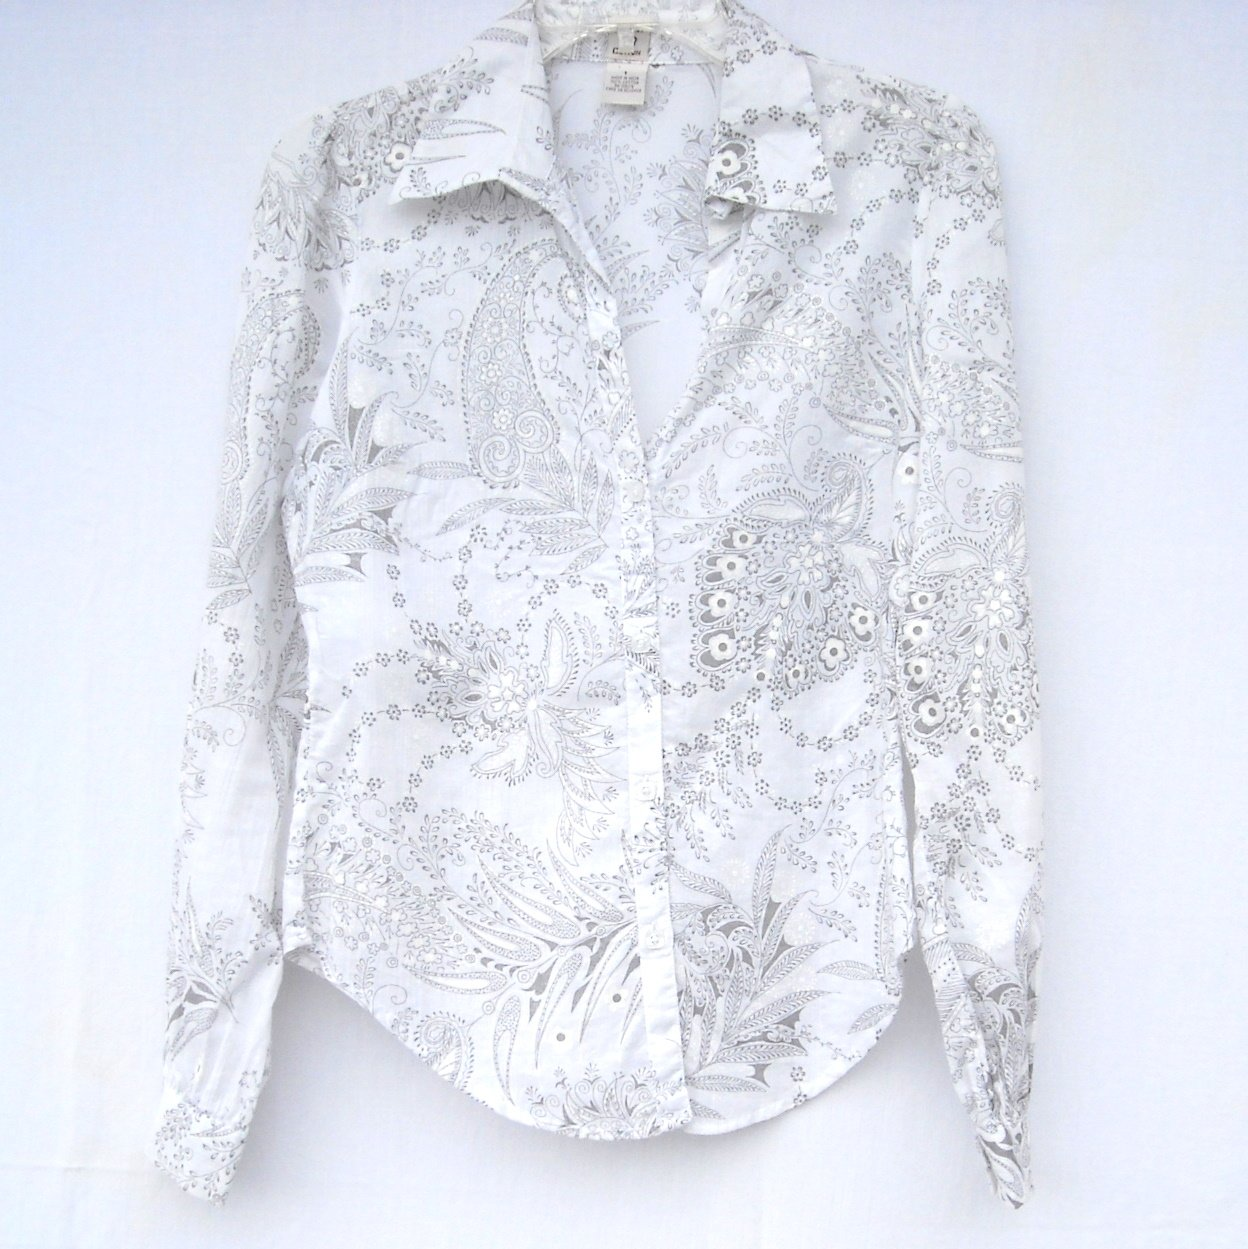 Johnny Cotton Misses Womens Blouse Shirt Top Size 1